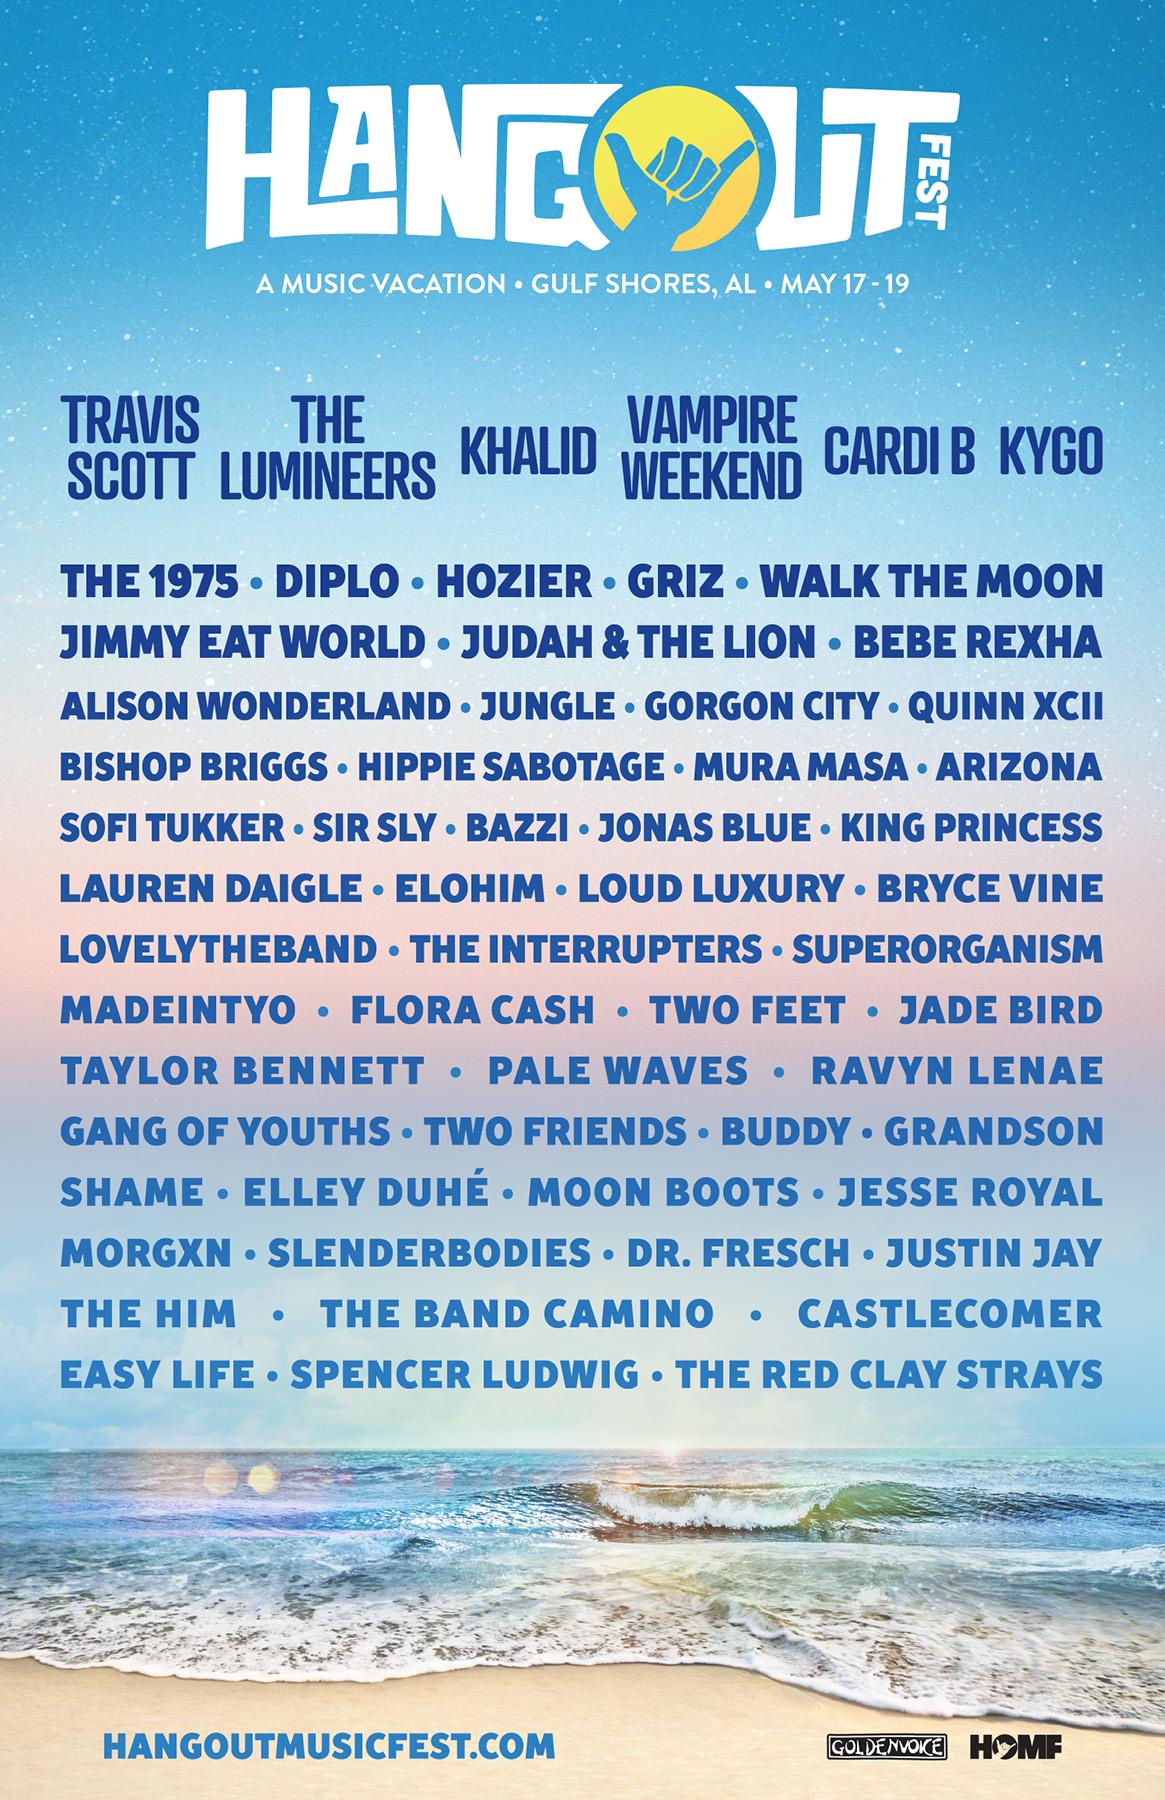 Travis Scott, The Lumineers, Cardi B and More to Headline 10th Annual Hangout Music Festival